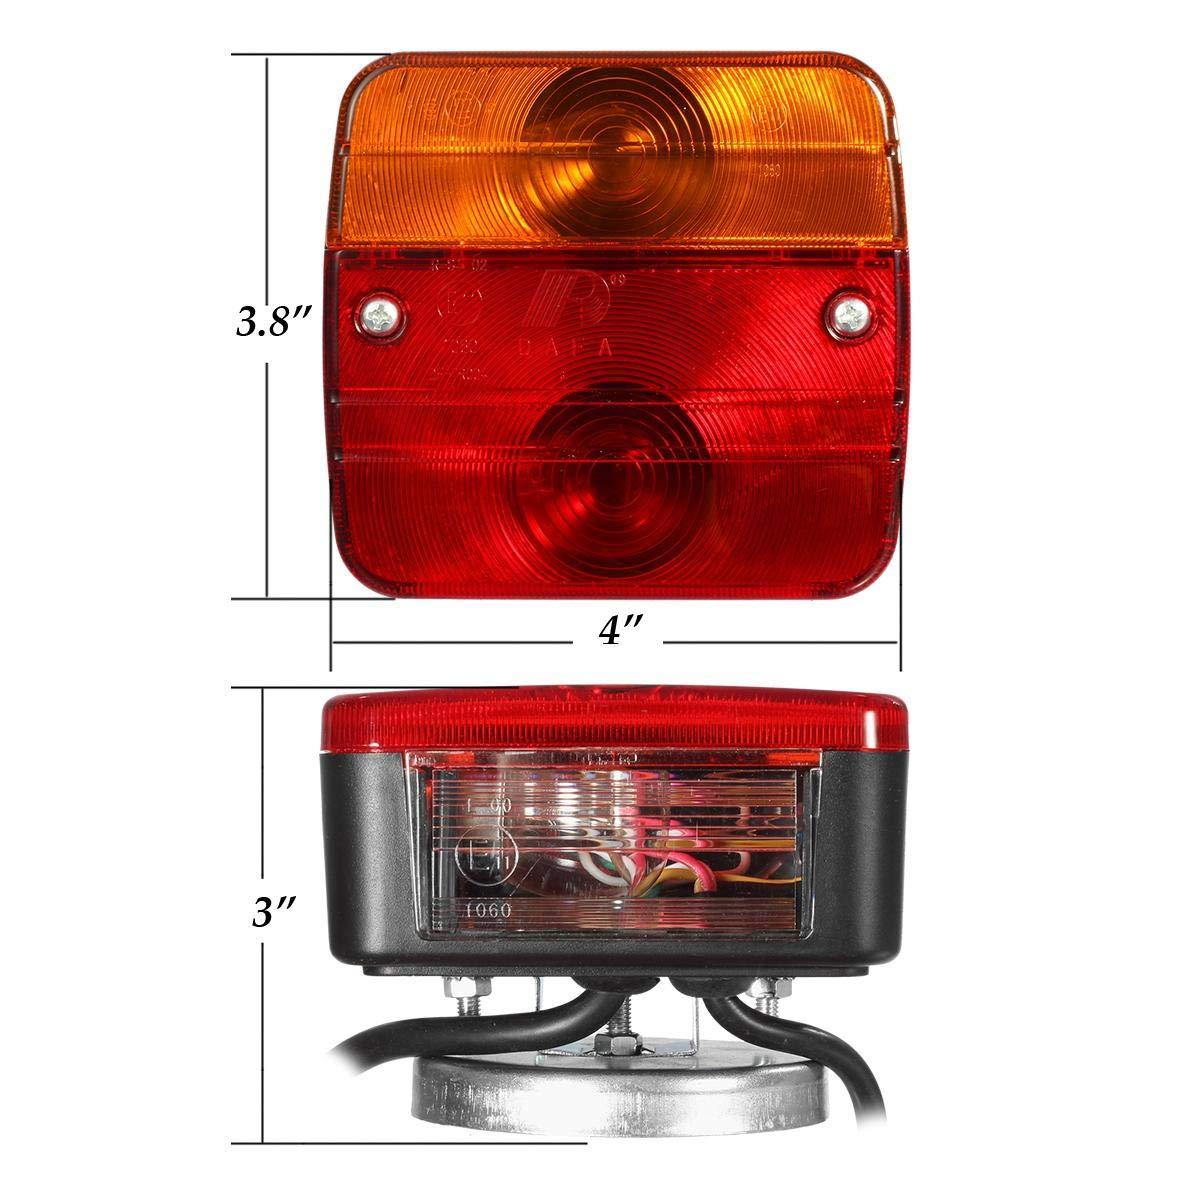 7 pin Plug Caravan PARTSAM Magnetic Trailer Rear Light 12V Board Towing Lights Lamps 7.5m Cable